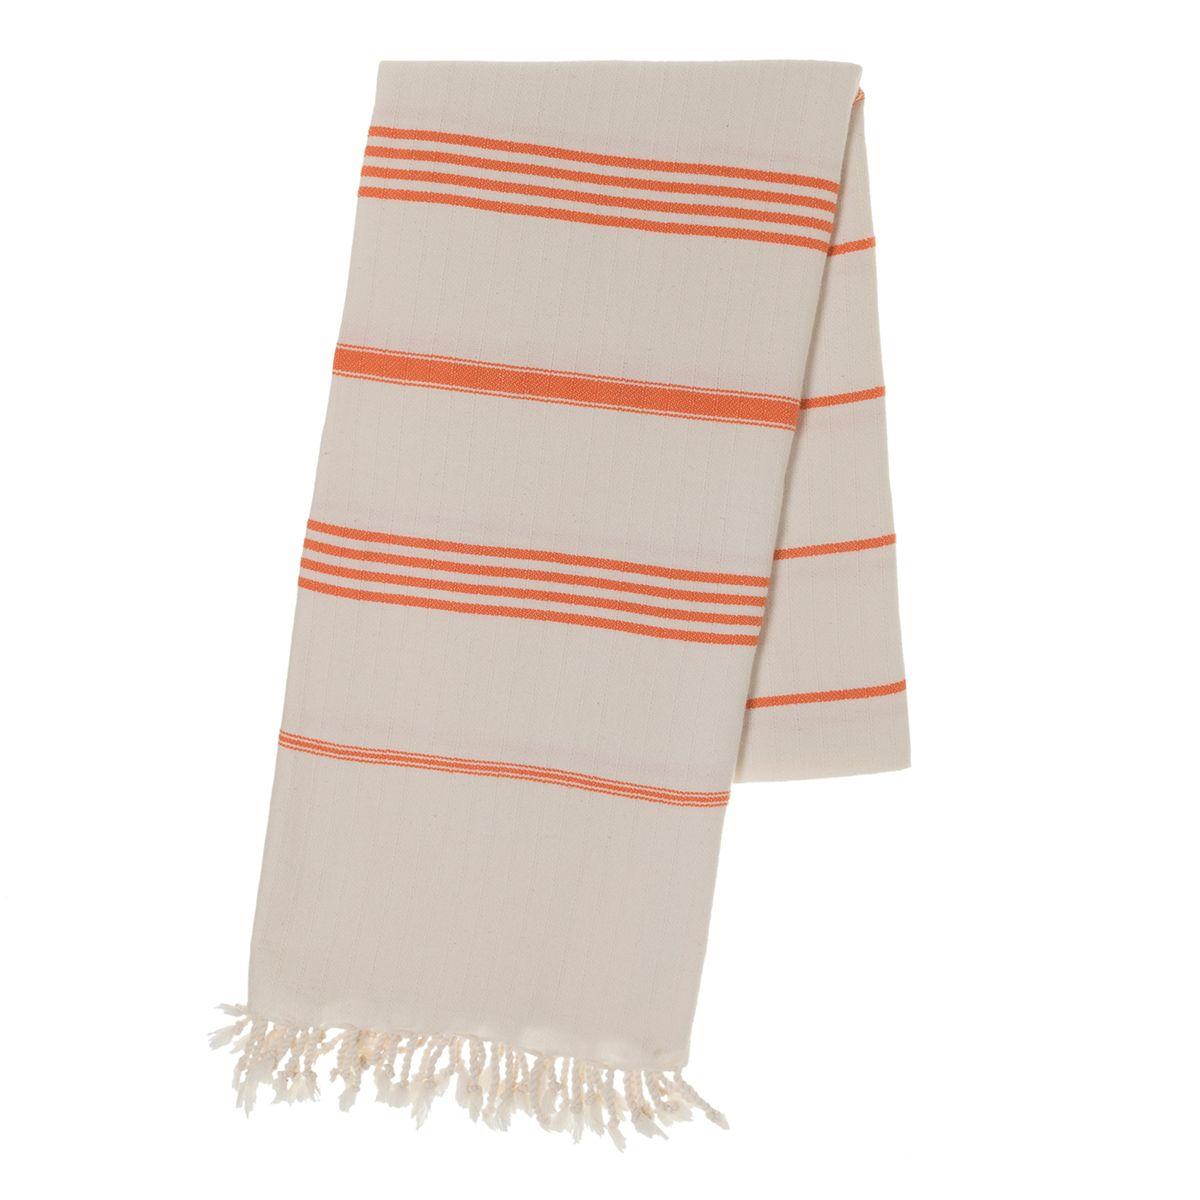 Peshtemal SultanCP - Orange Stripes